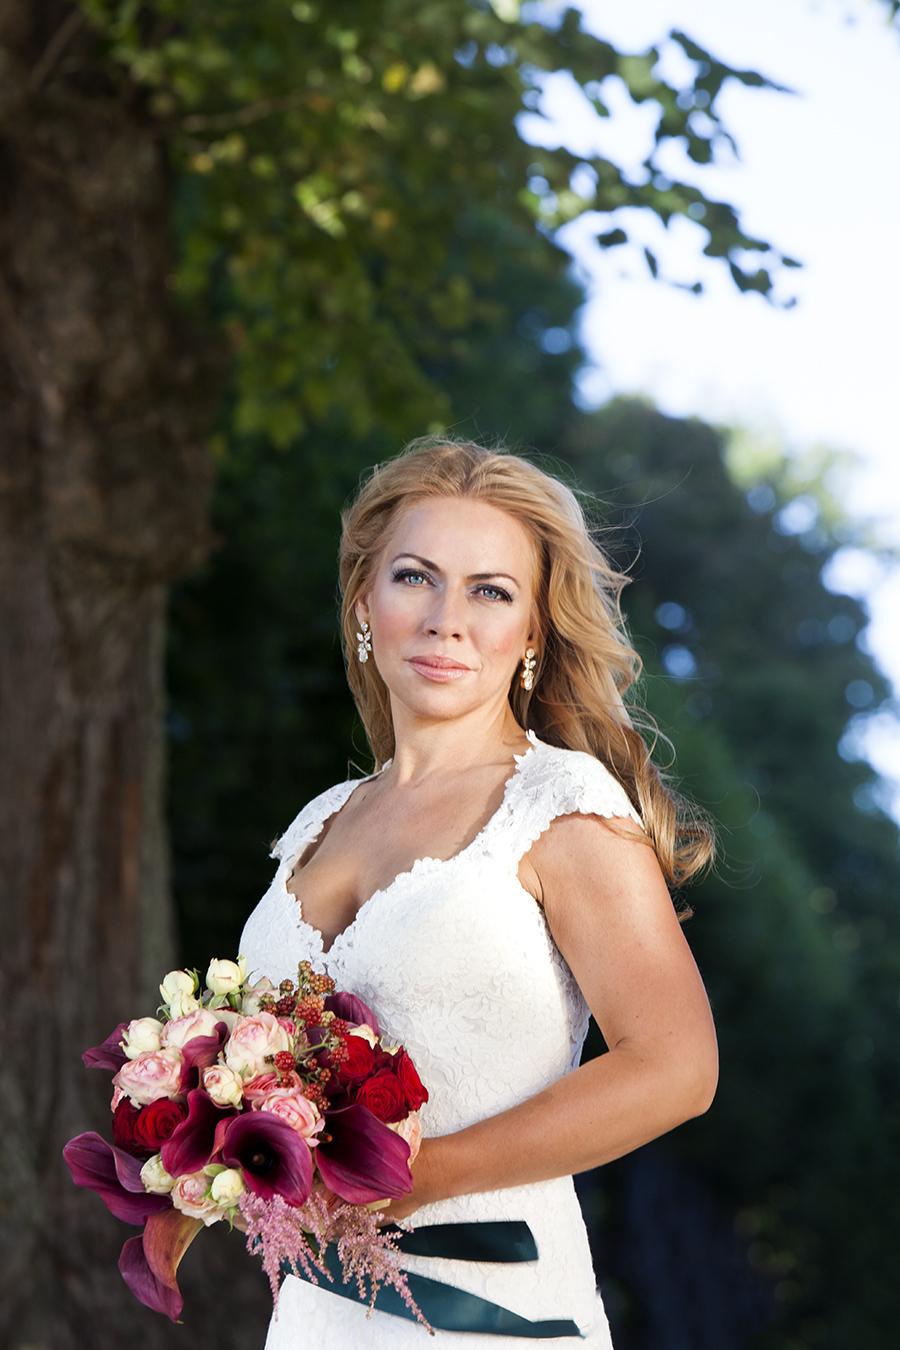 bröllopsfotograf Anne Vindehall Smajl studio